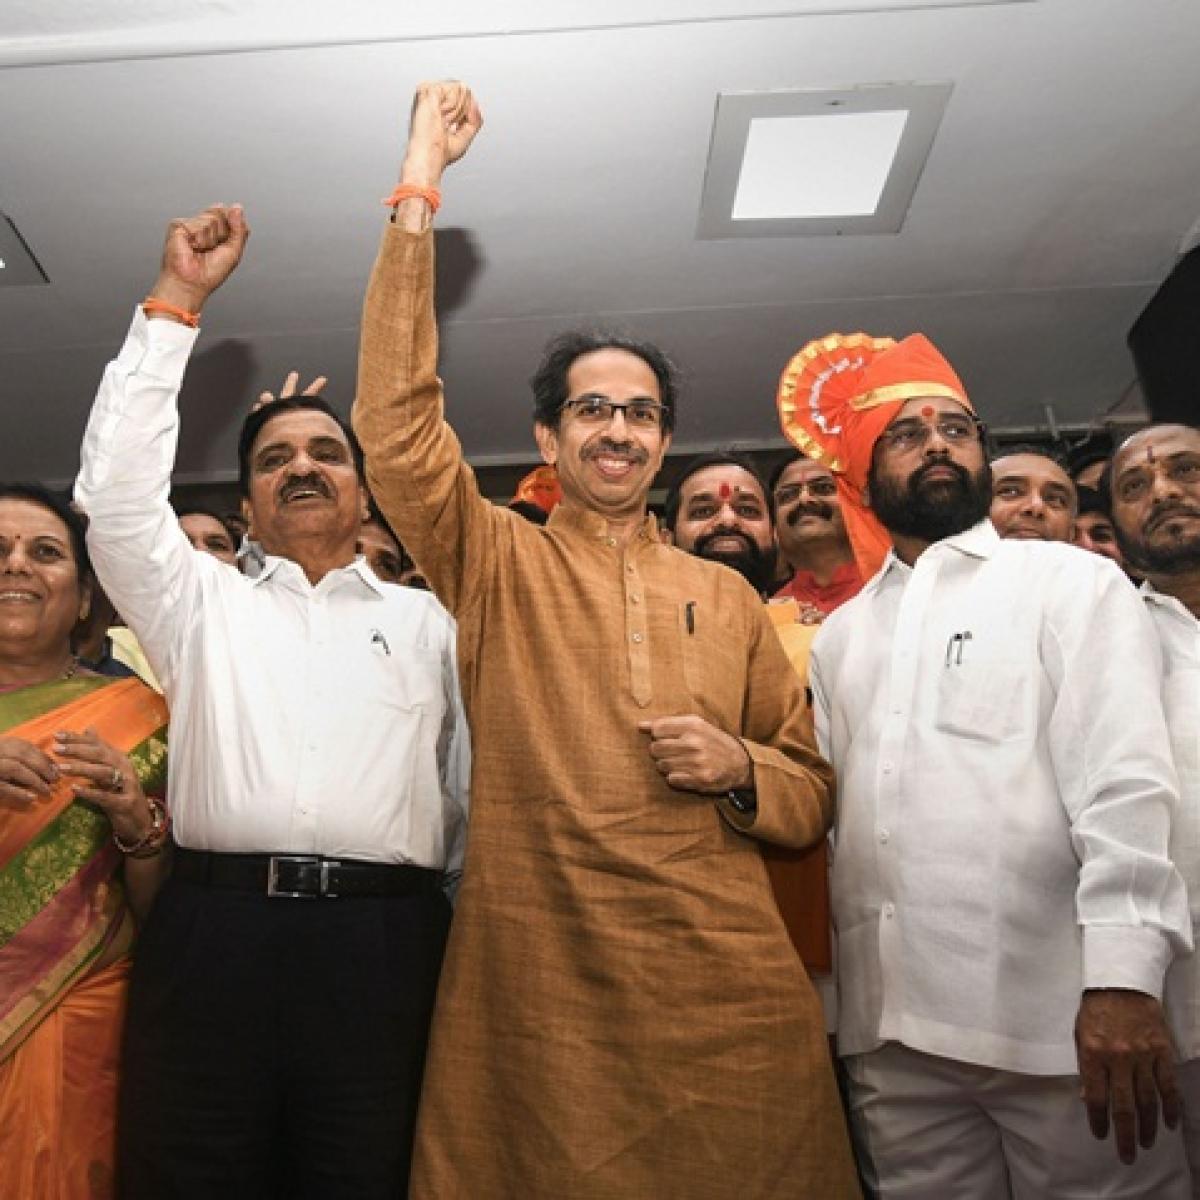 Uddhav Thackeray cancels Rs 380 crore sugar mills' loan guarantee given by Fadnavis govt